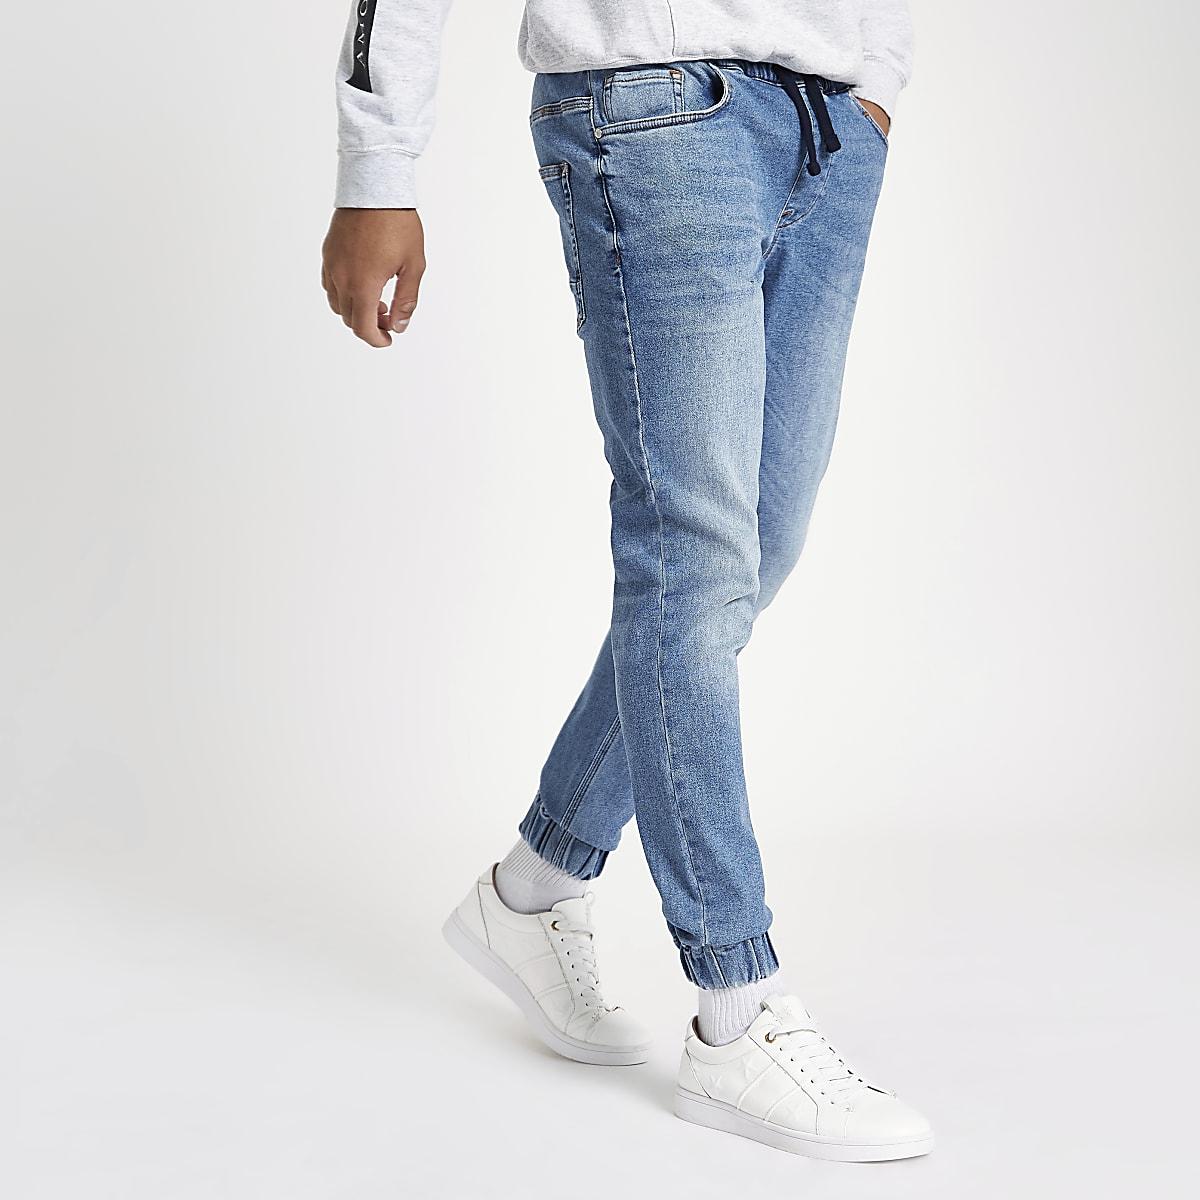 Joggingbroek Denim Heren.Ryan Middenblauwe Joggingjeans Joggingbroek Jeans Jeans Heren